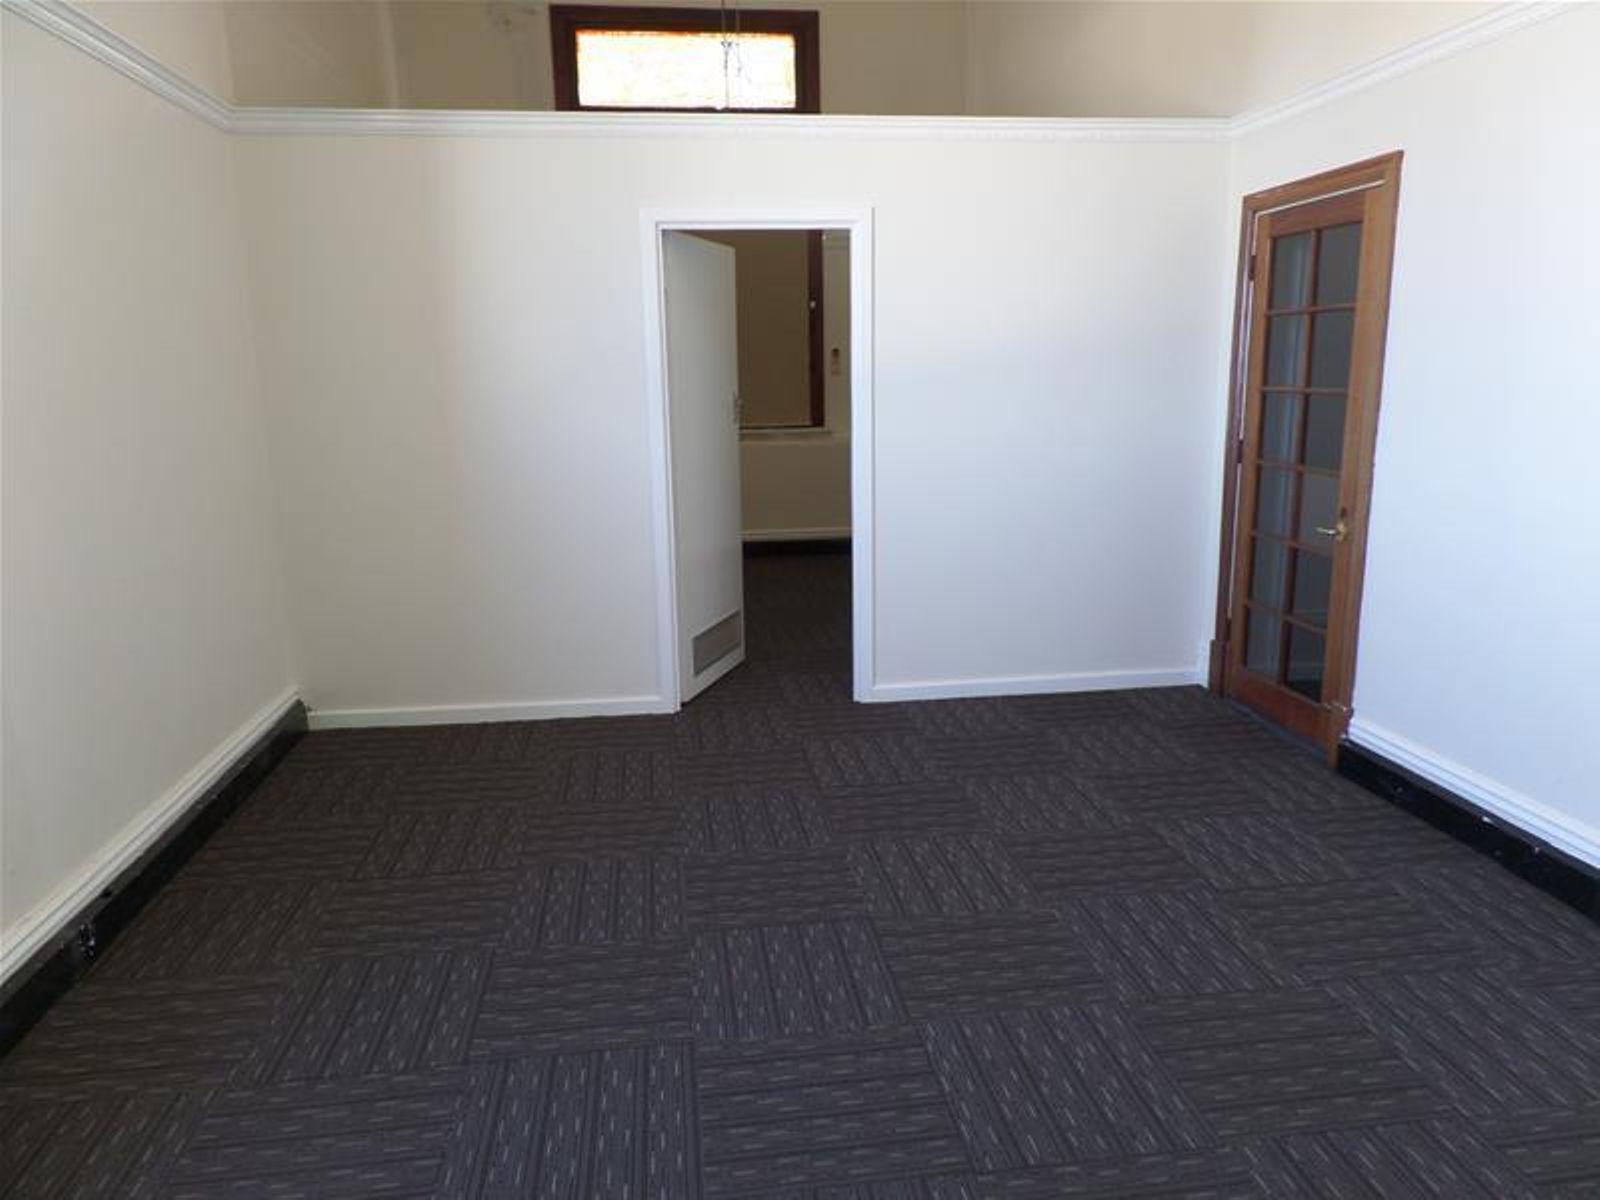 Suite F10/140 - 144 Hannan Street, Kalgoorlie, WA 6430